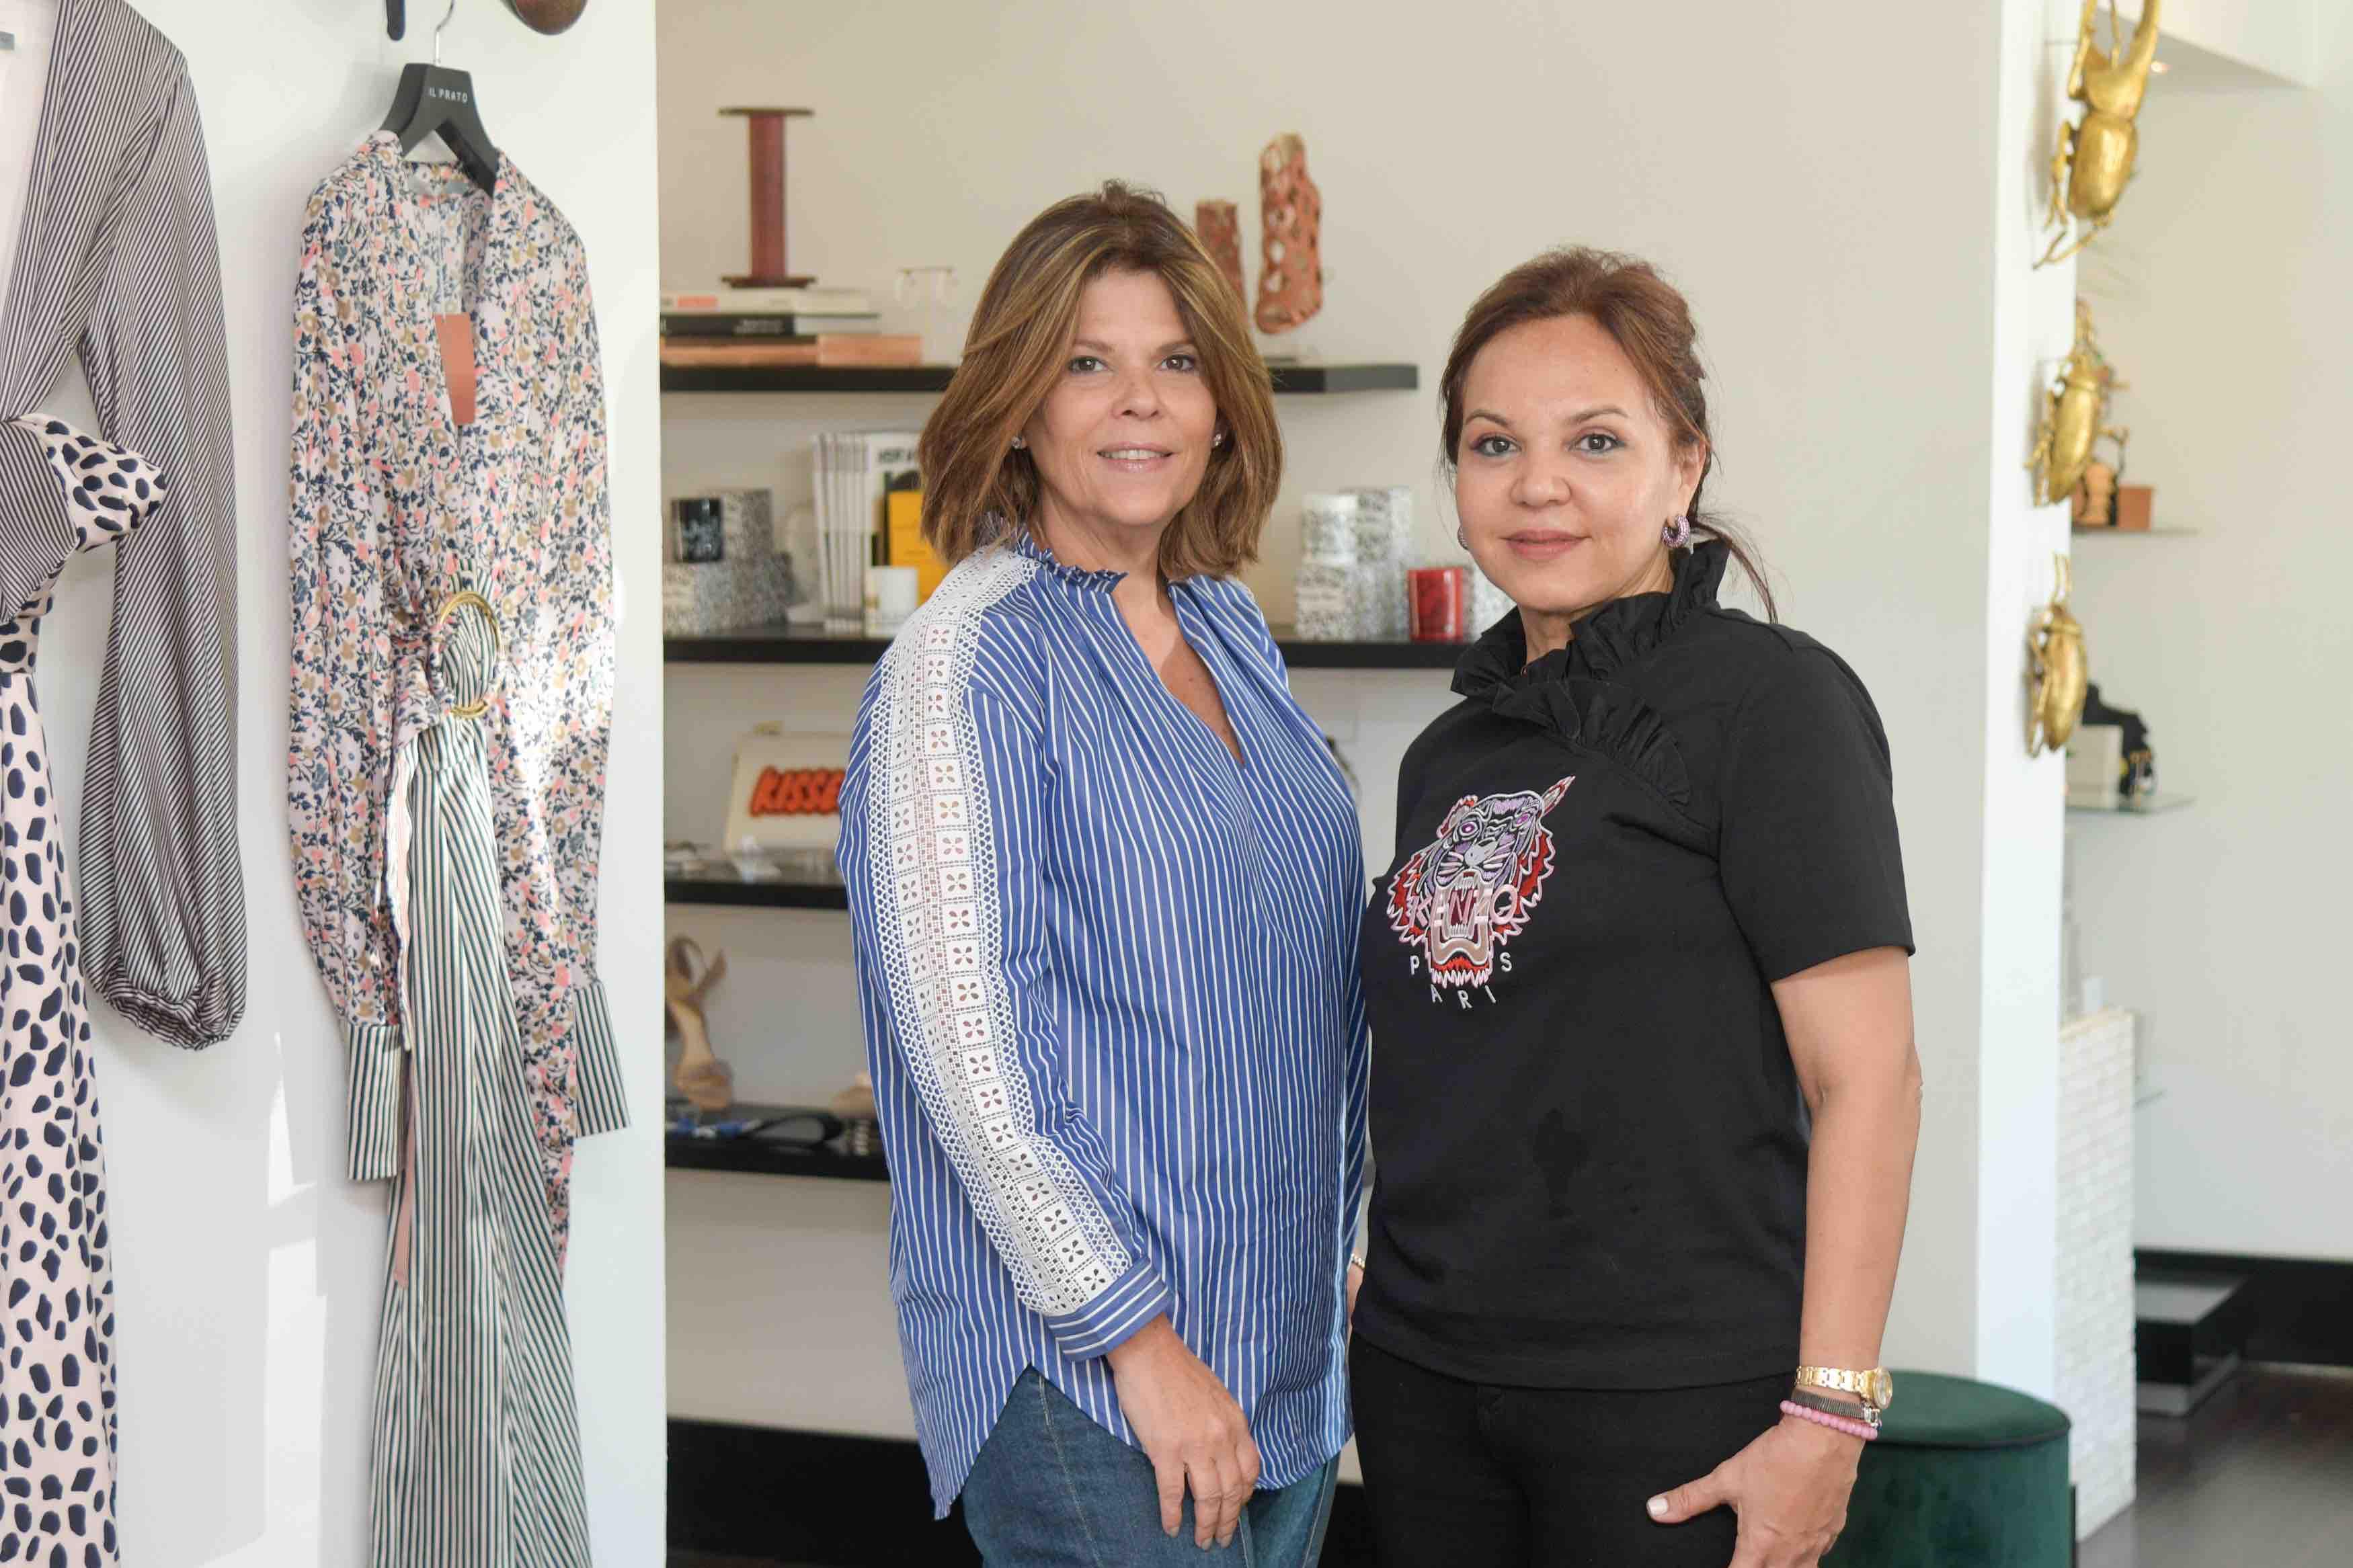 5.Vilma León & Mari del Carmen Vieites